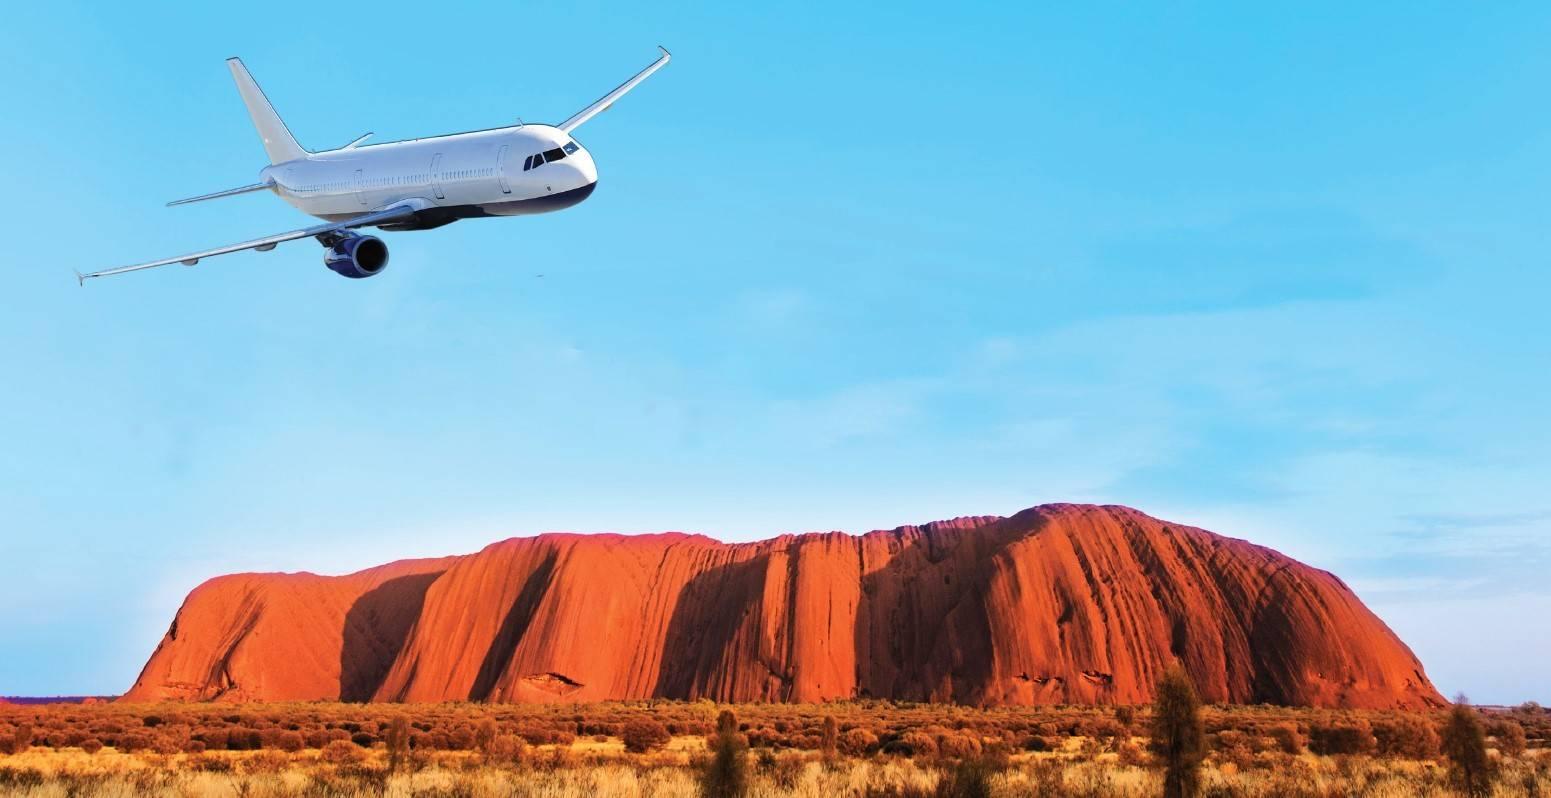 26th November Toowoomba to Uluru Weekend Getaway